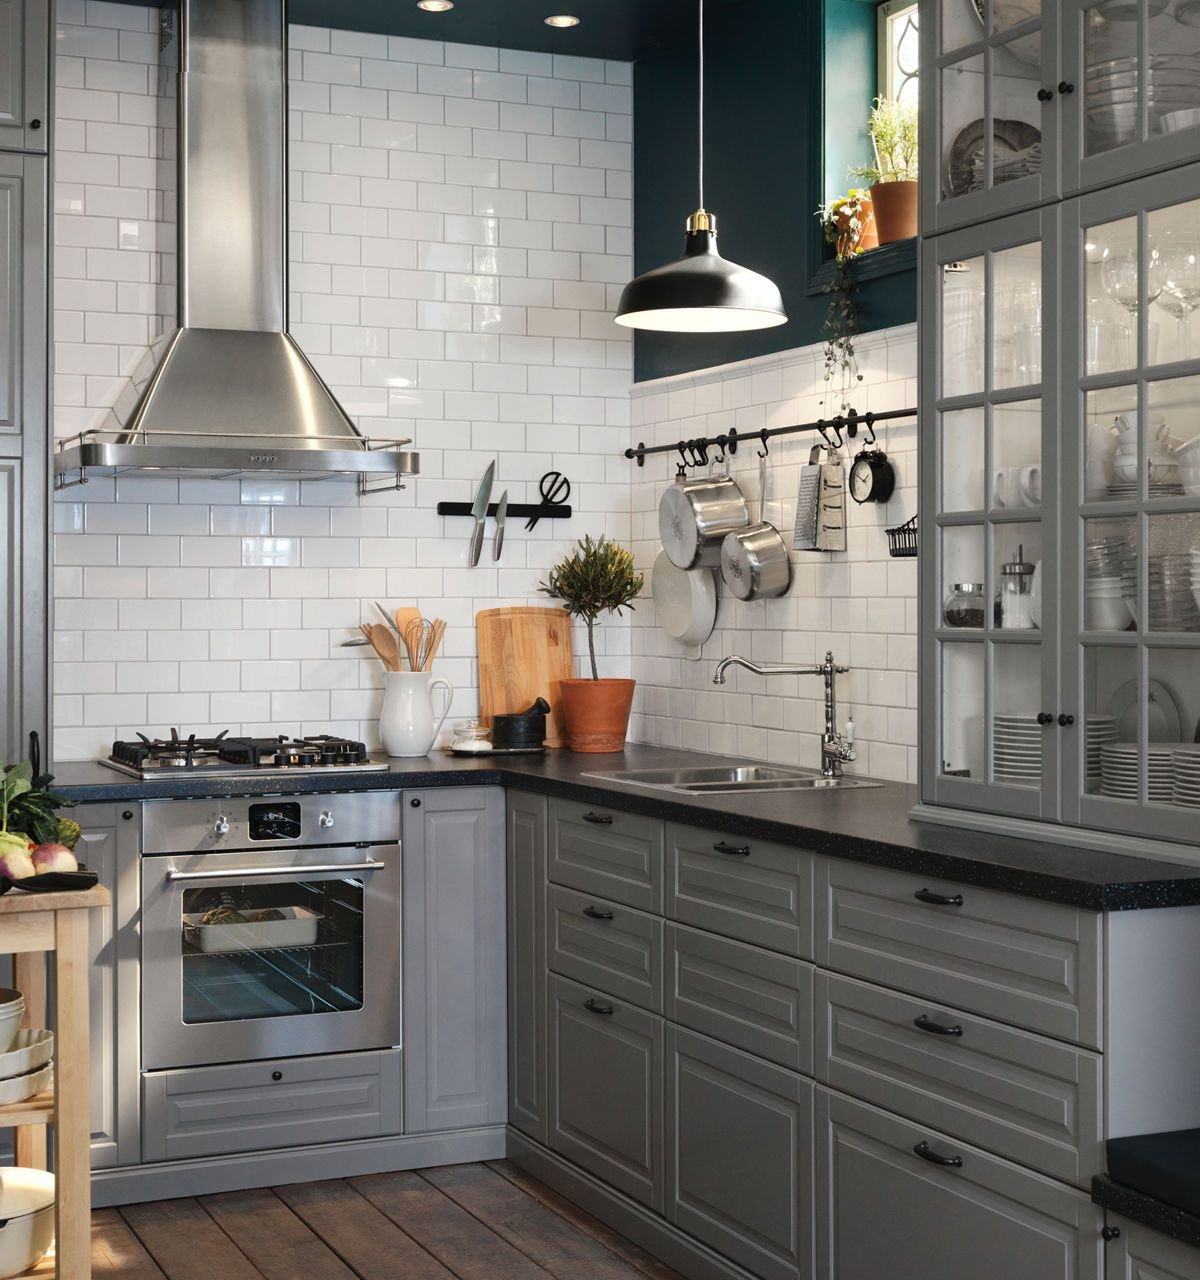 NLIS Digital IKEA Catalogue 2018 | partsofdesign | Pinterest